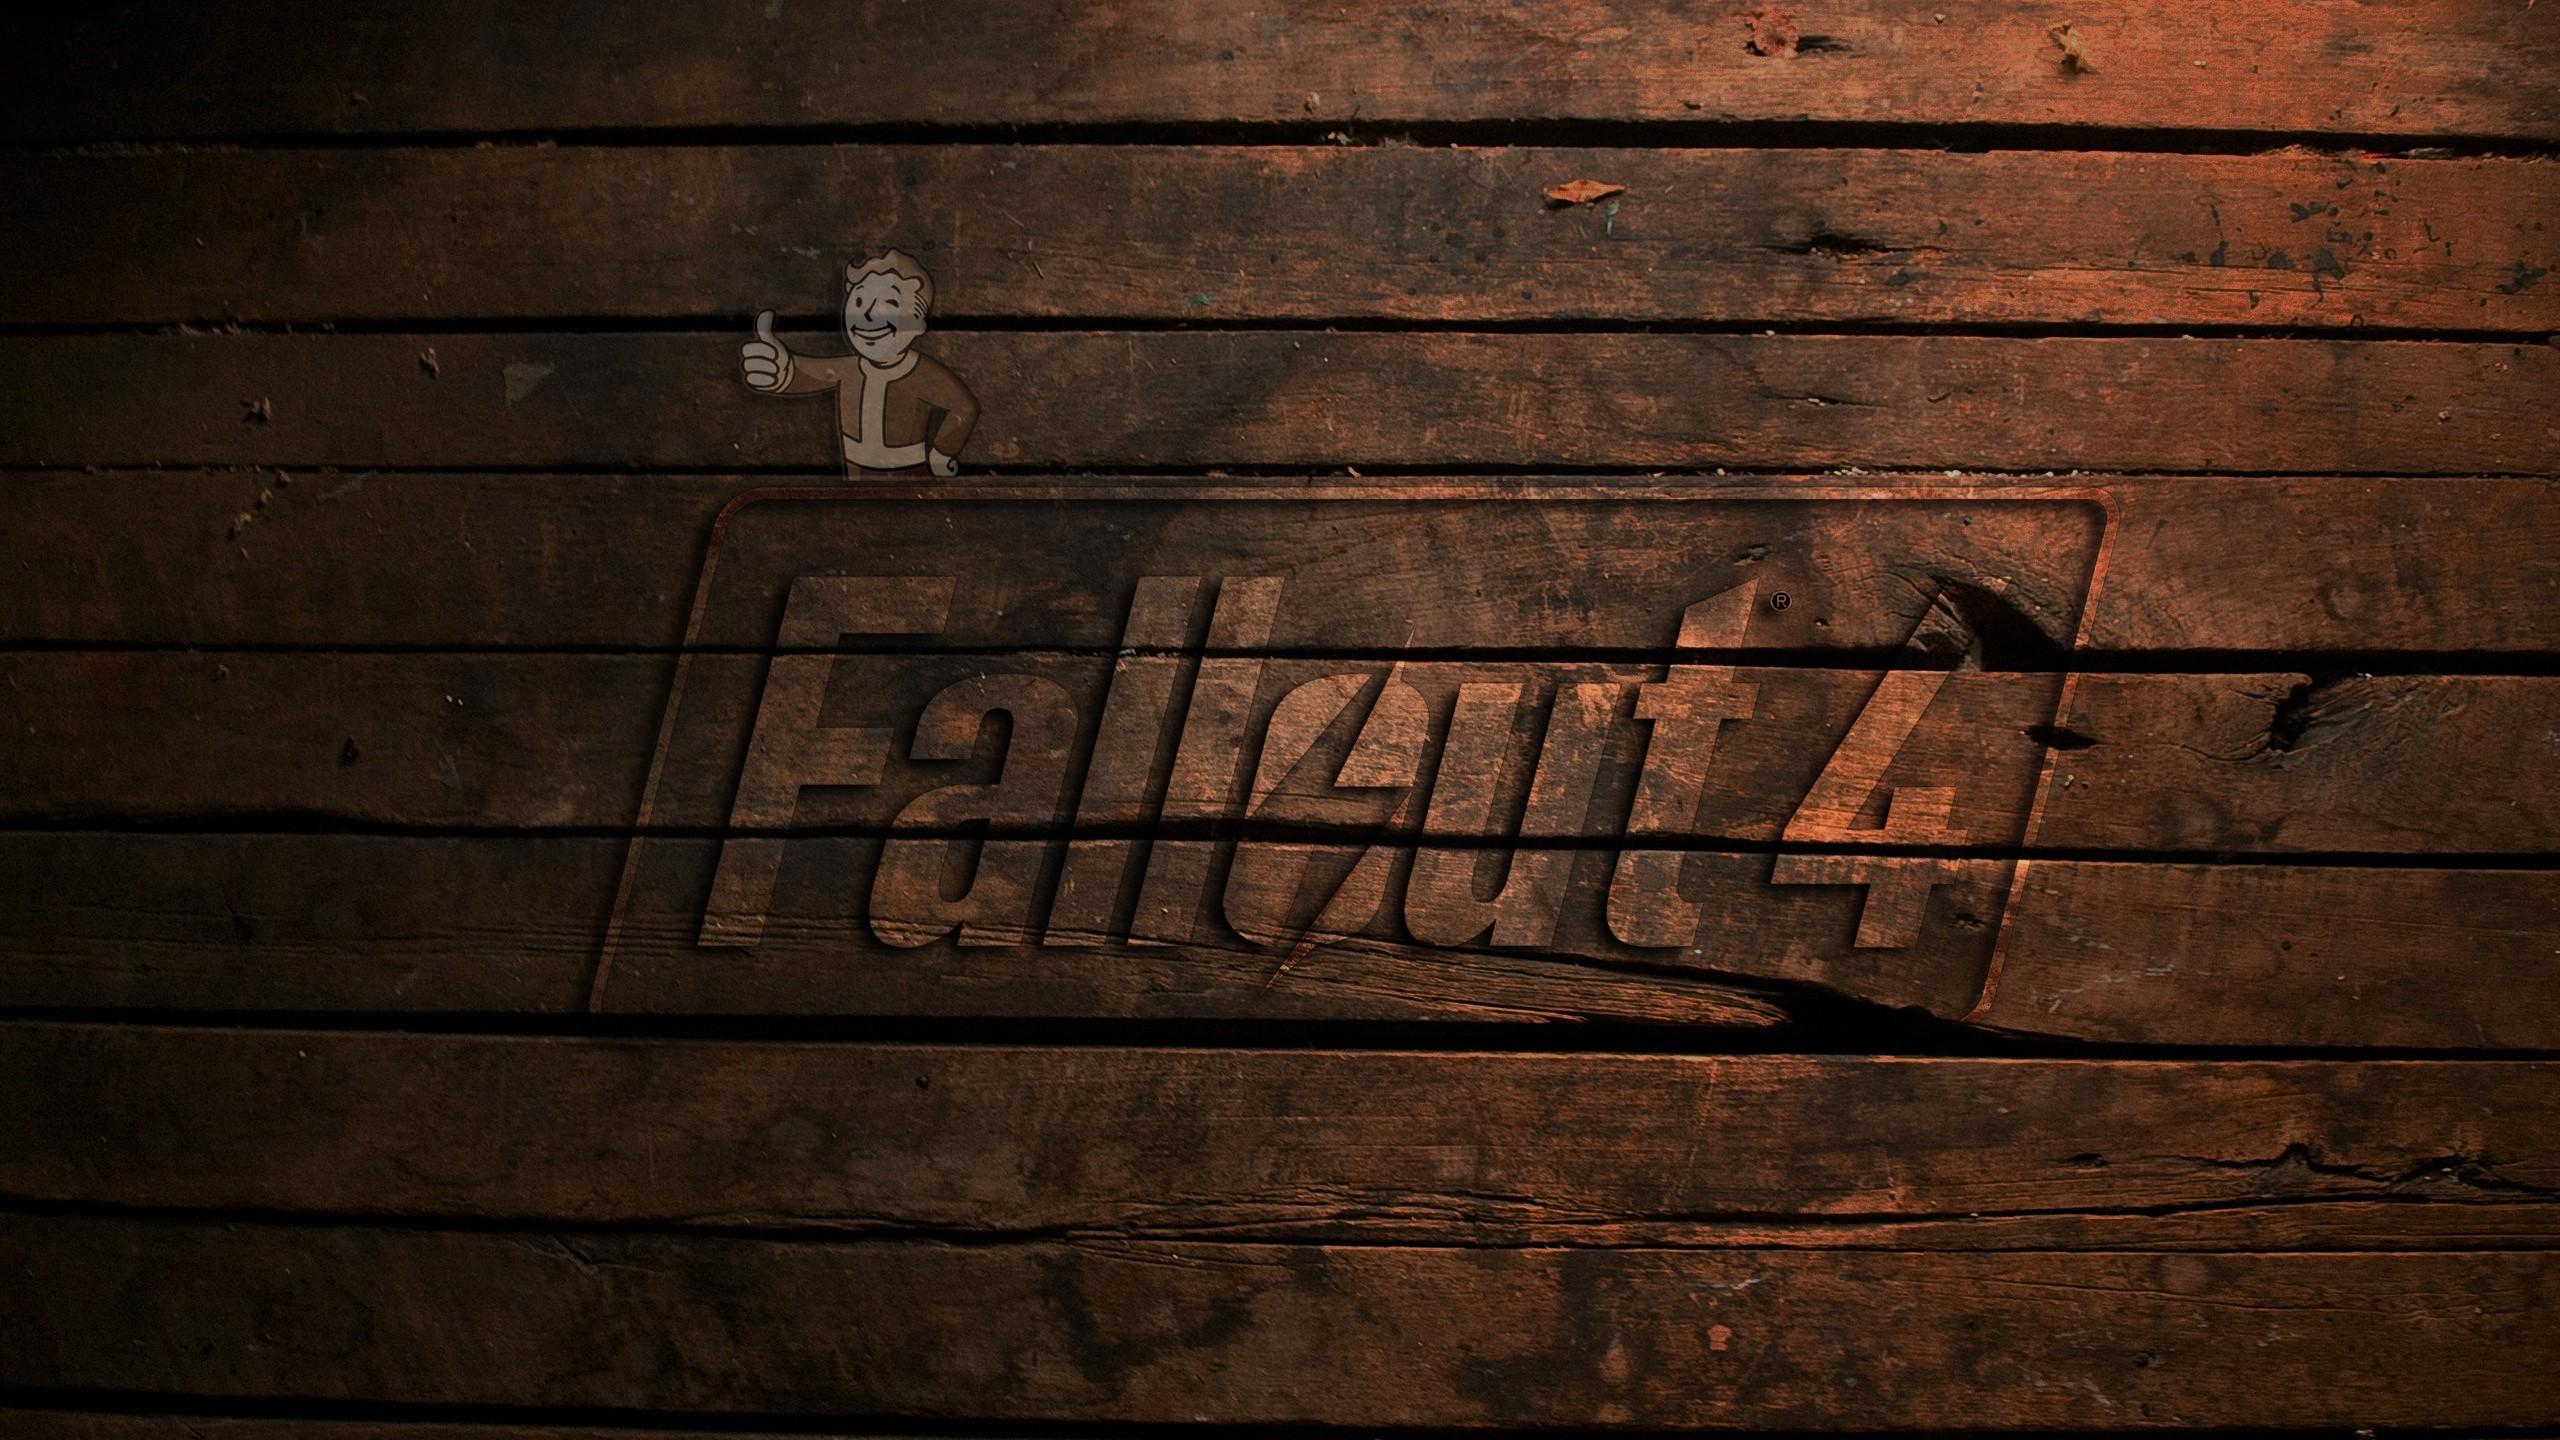 Wallpaper : black, reflection, wall, wood, texture, Fallout 4, light